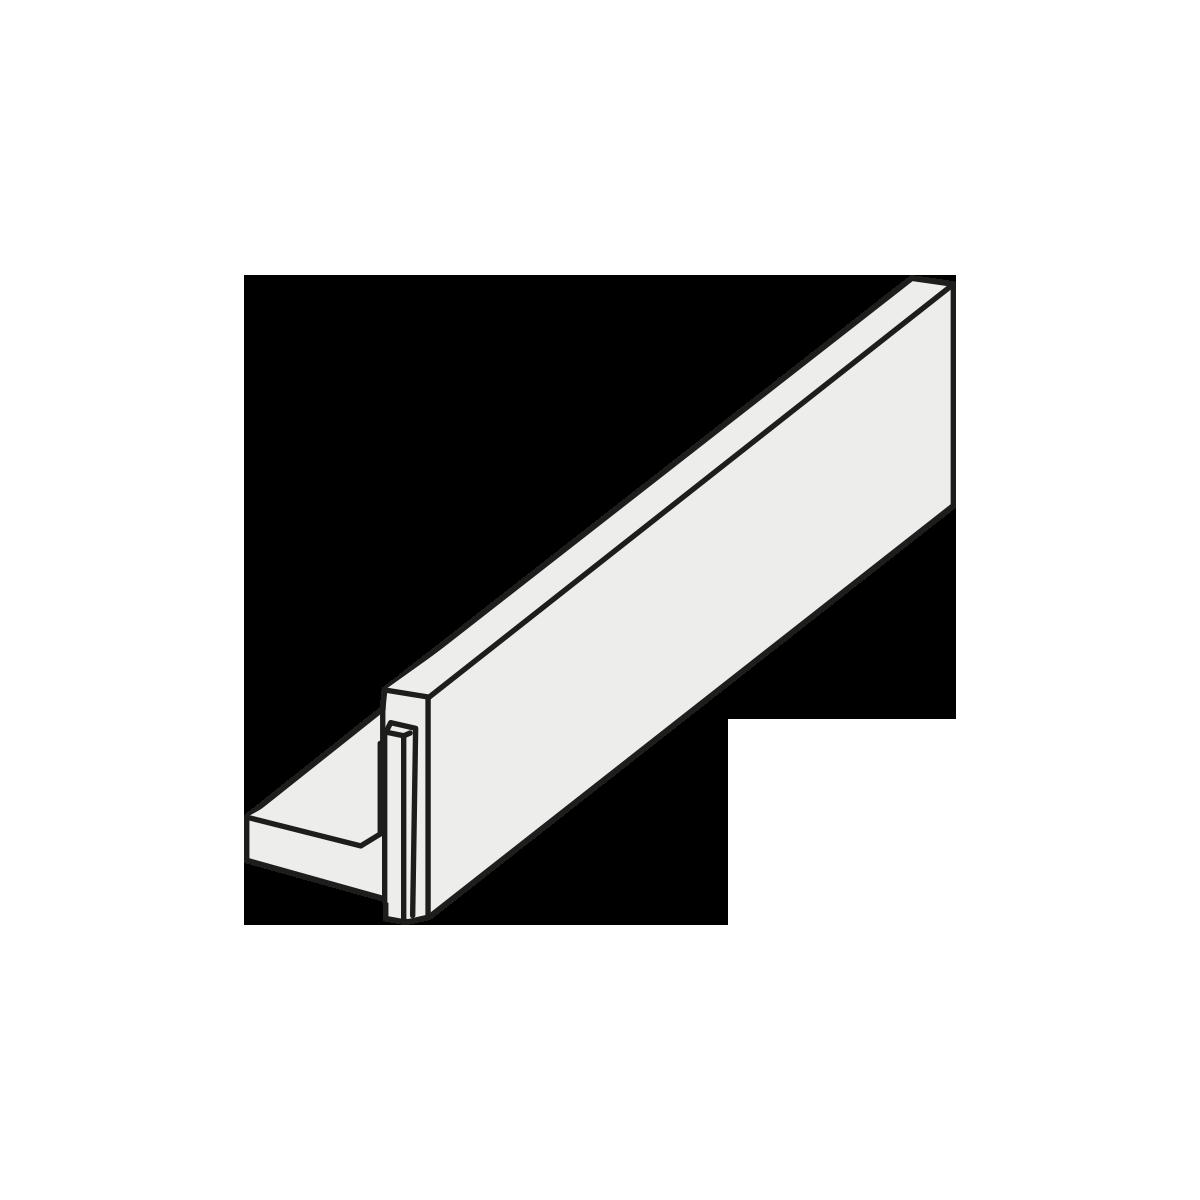 ParkLine Støttemur 80 - 45x120x10 cm Grå